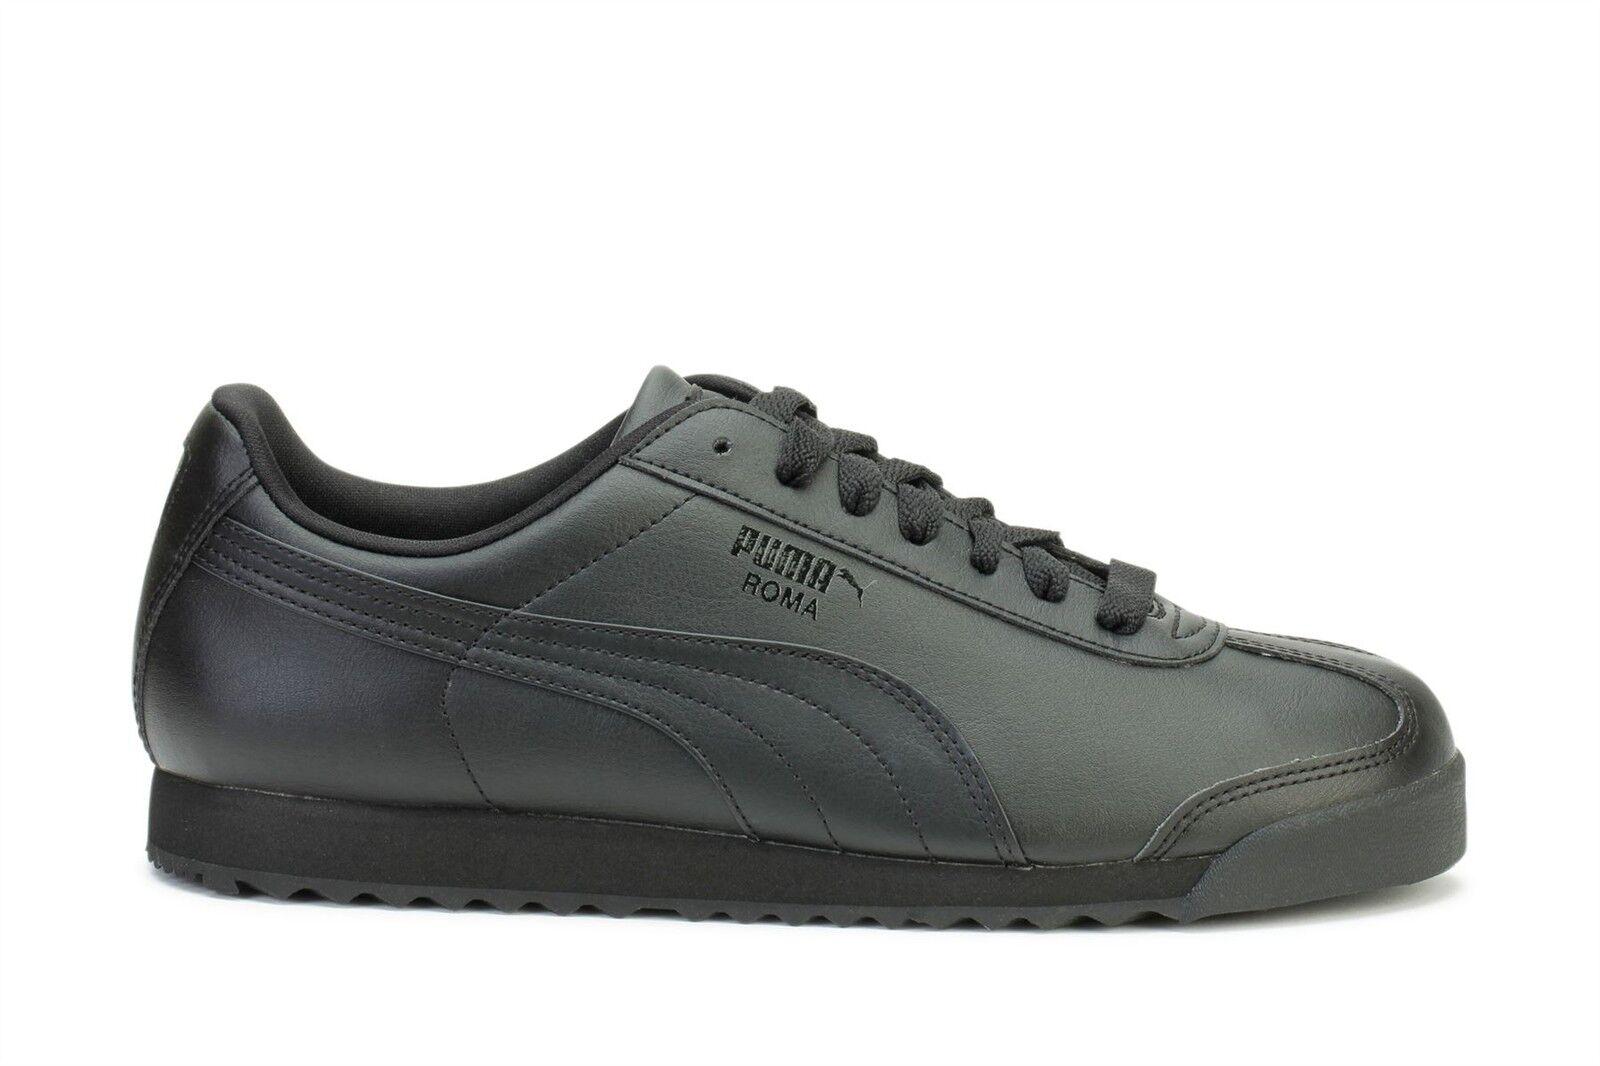 Puma hommes Classic Sneakers Roma Basic noir noir 353572-17